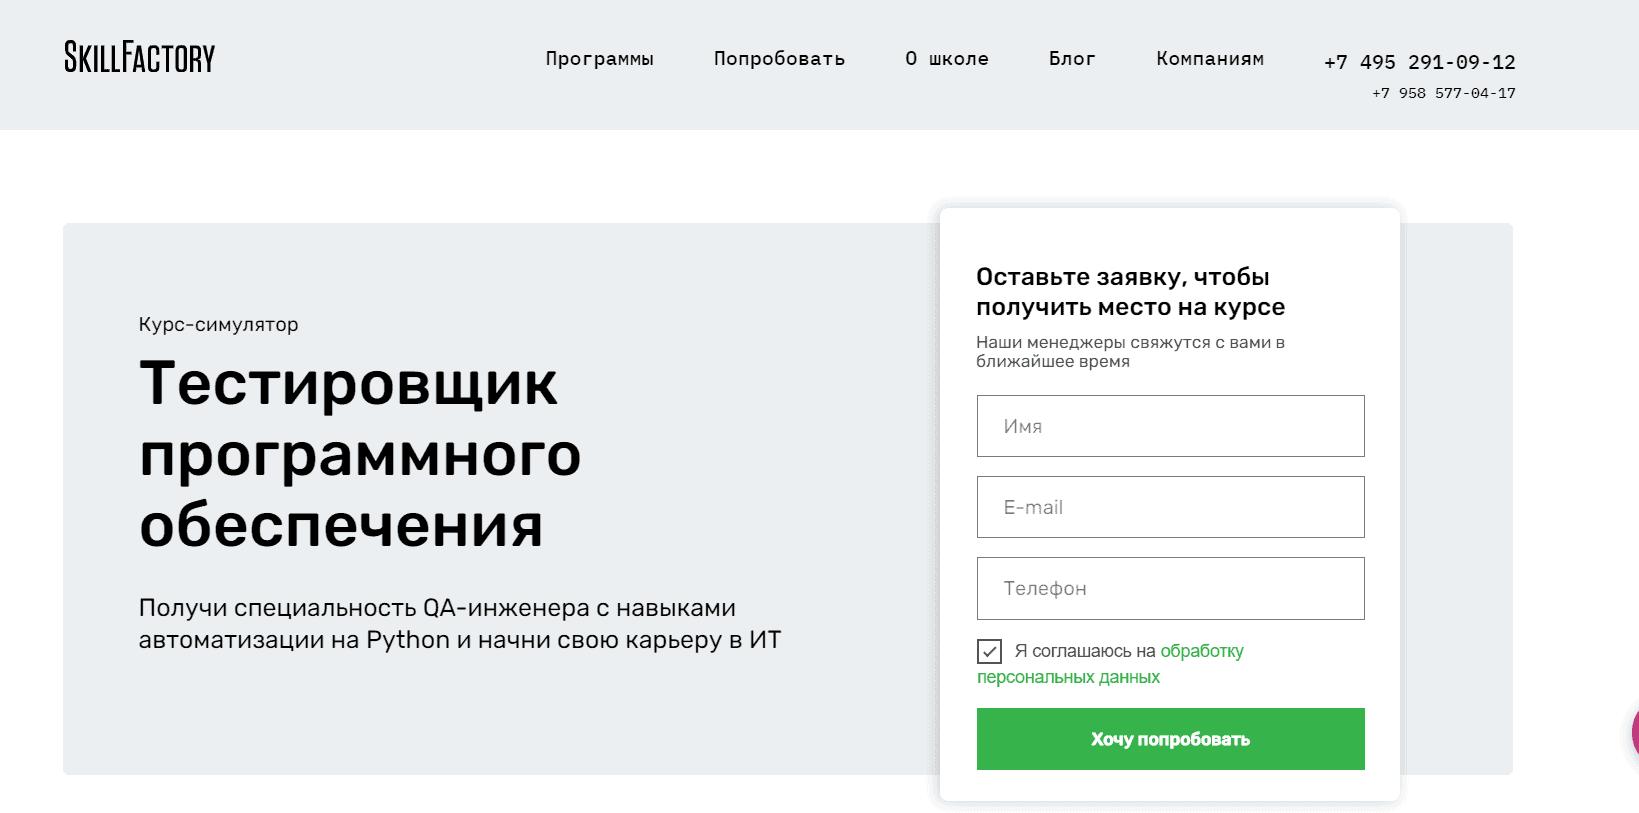 Онлайн-курс Тестировщик программного обеспечения